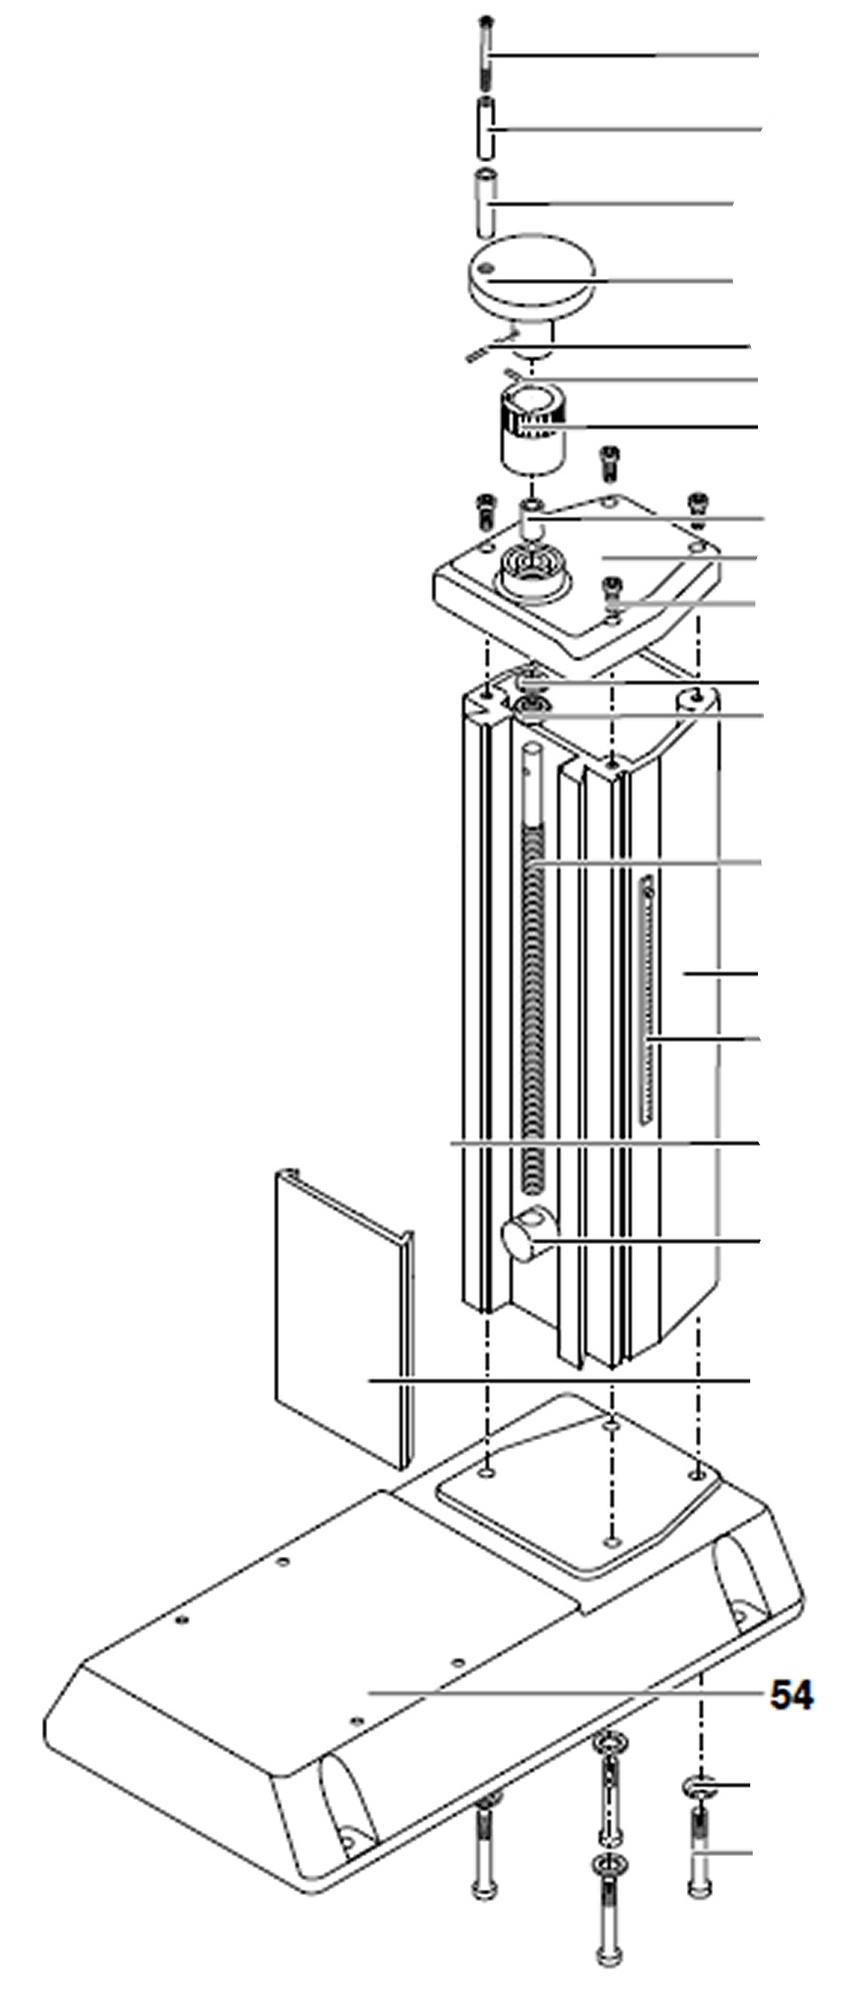 PROXXON 27110-54 Fuß für Micro-Fräse MF 70